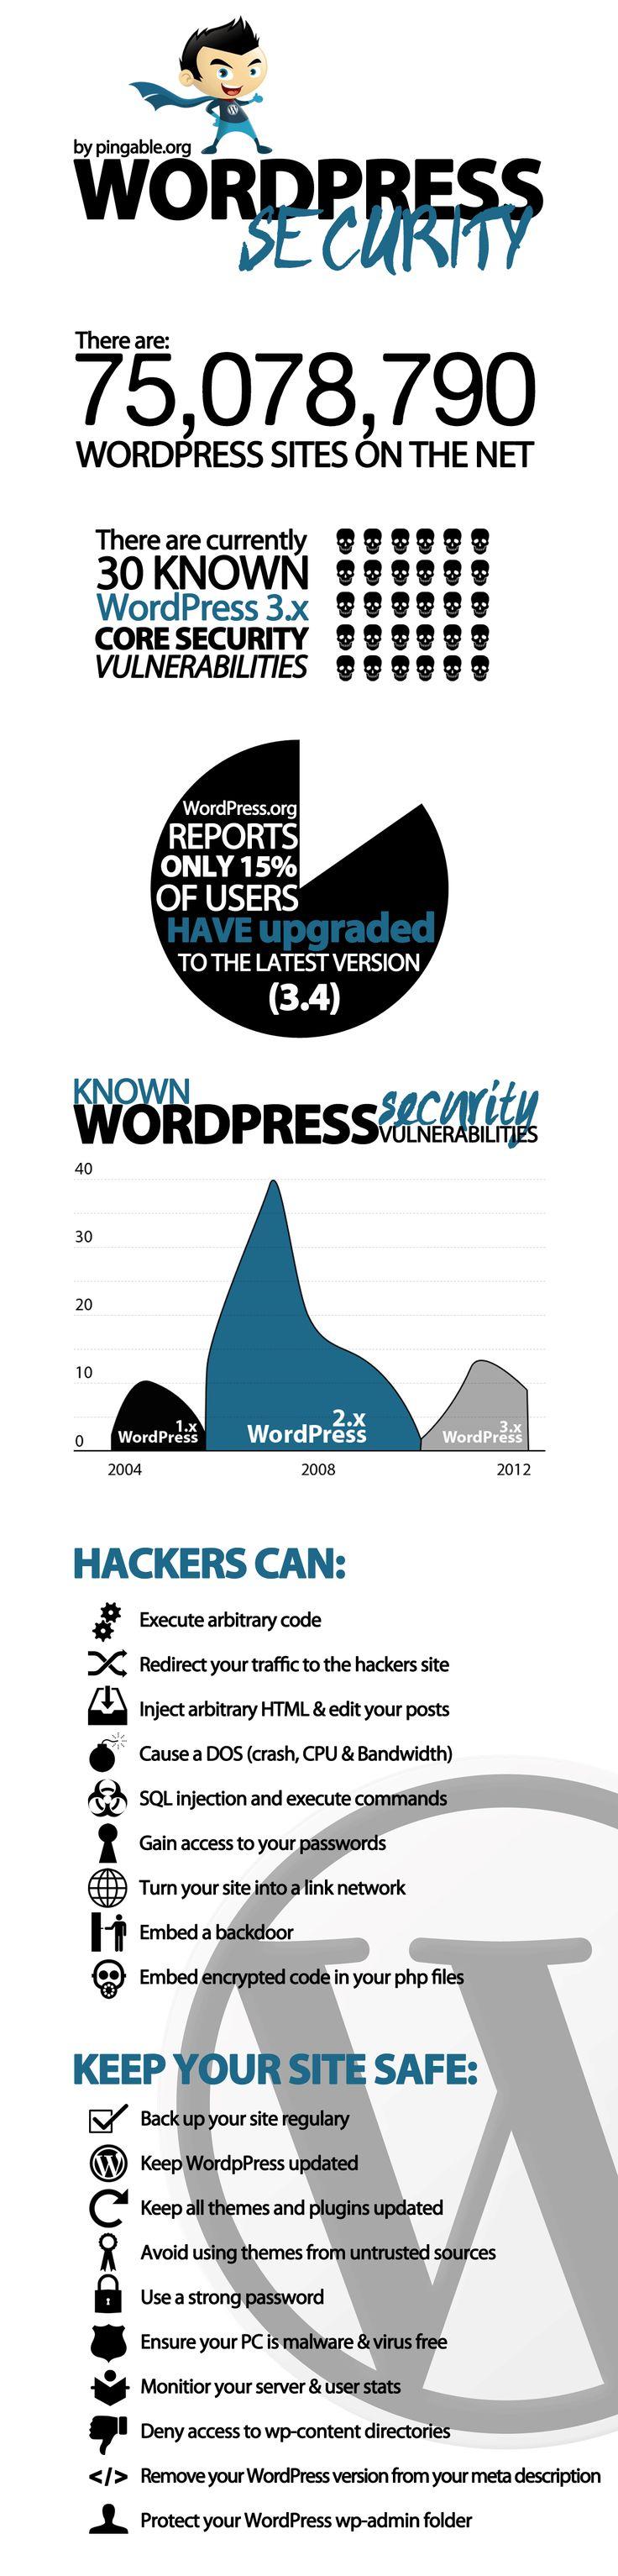 Wordpress security #infographic